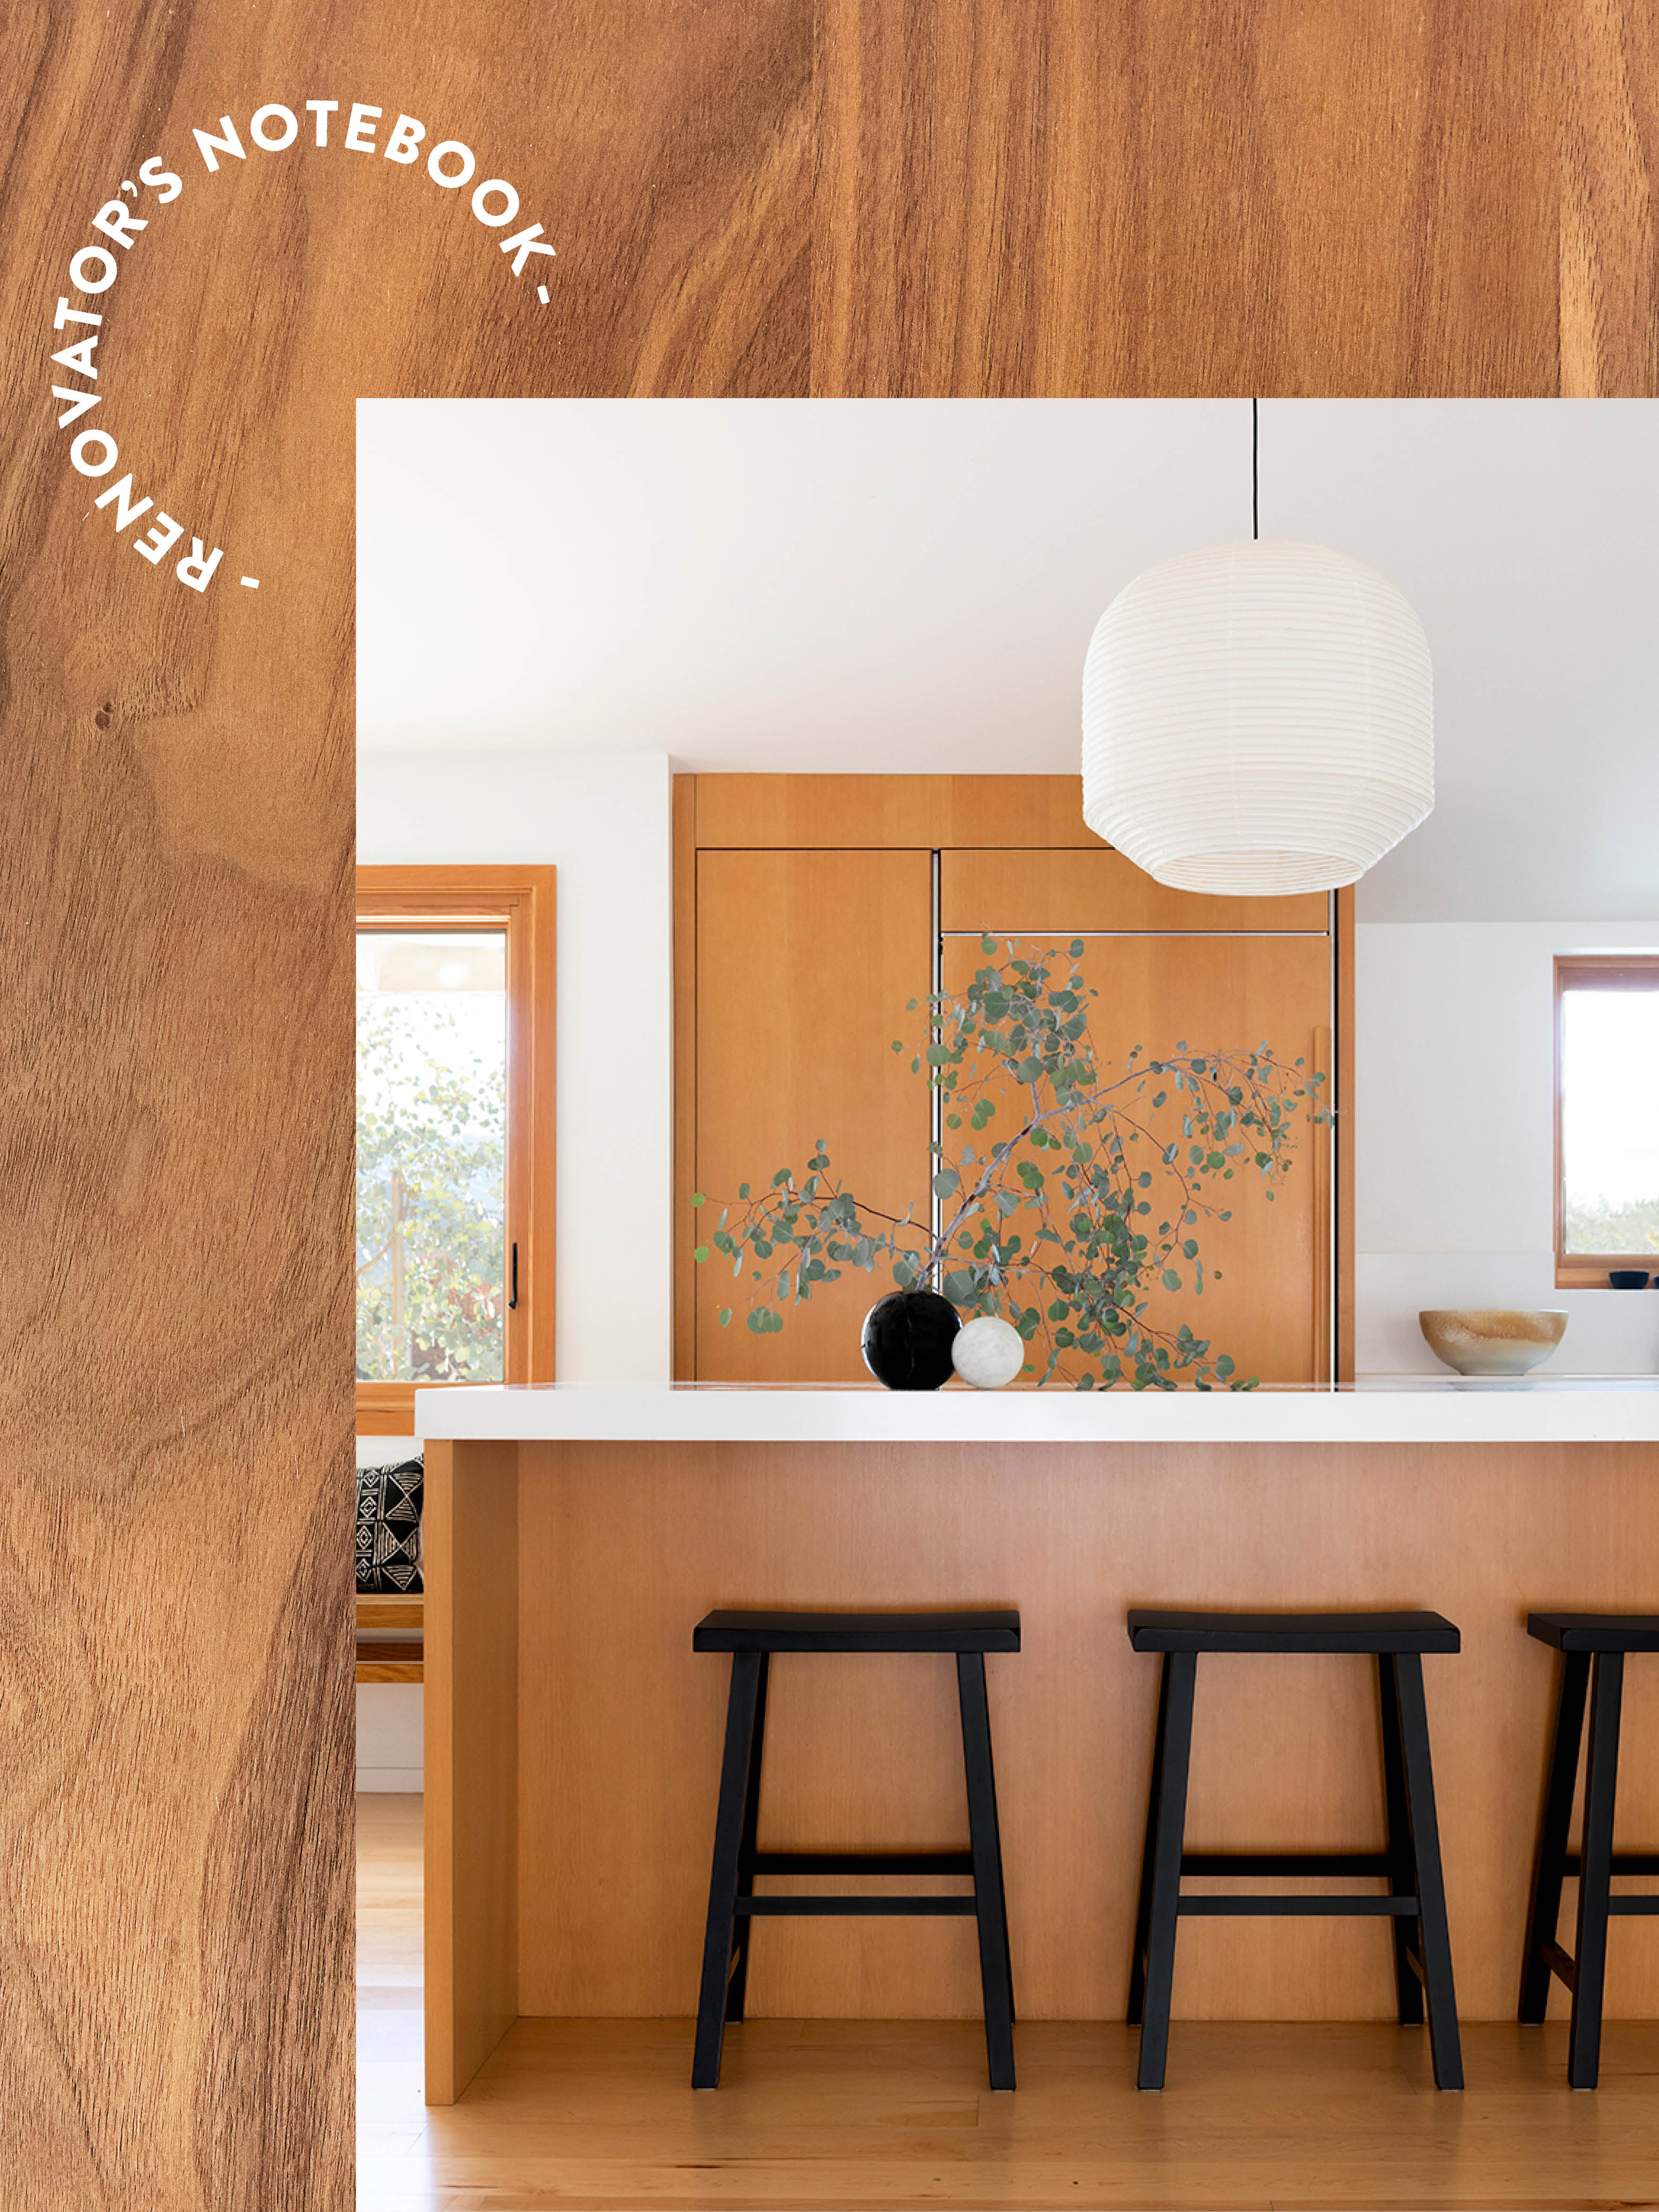 wood kitchen on wood background